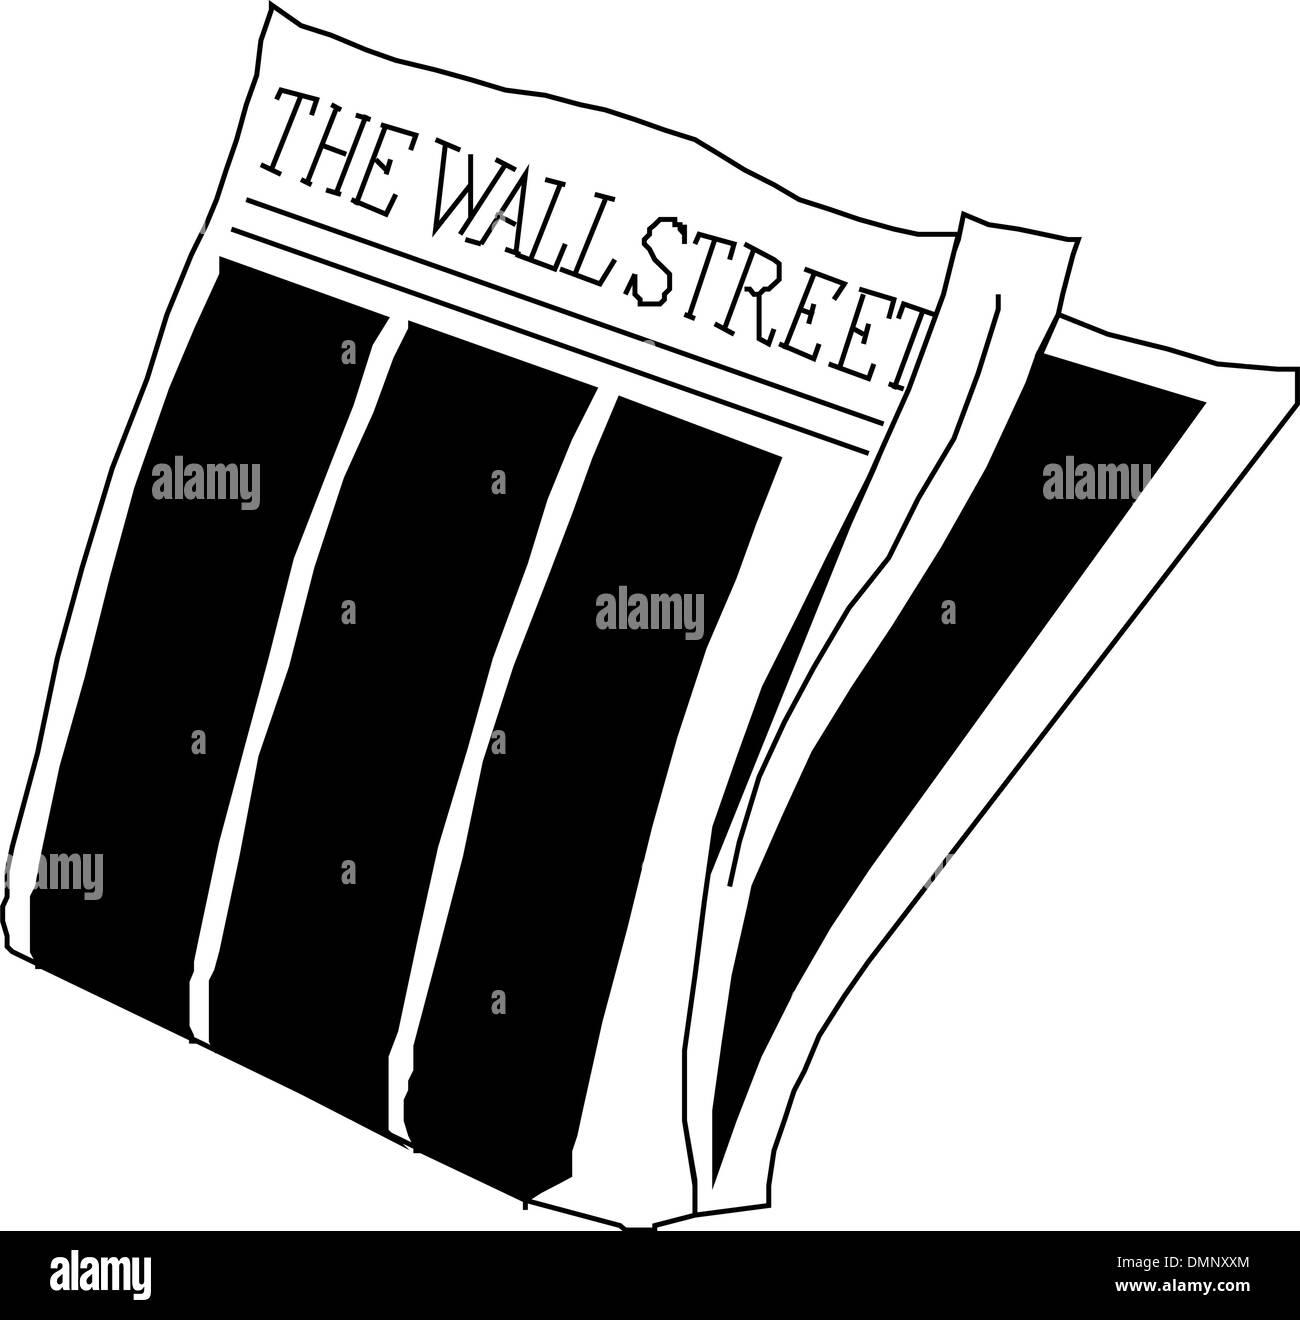 Newspaper wall street - Stock Image